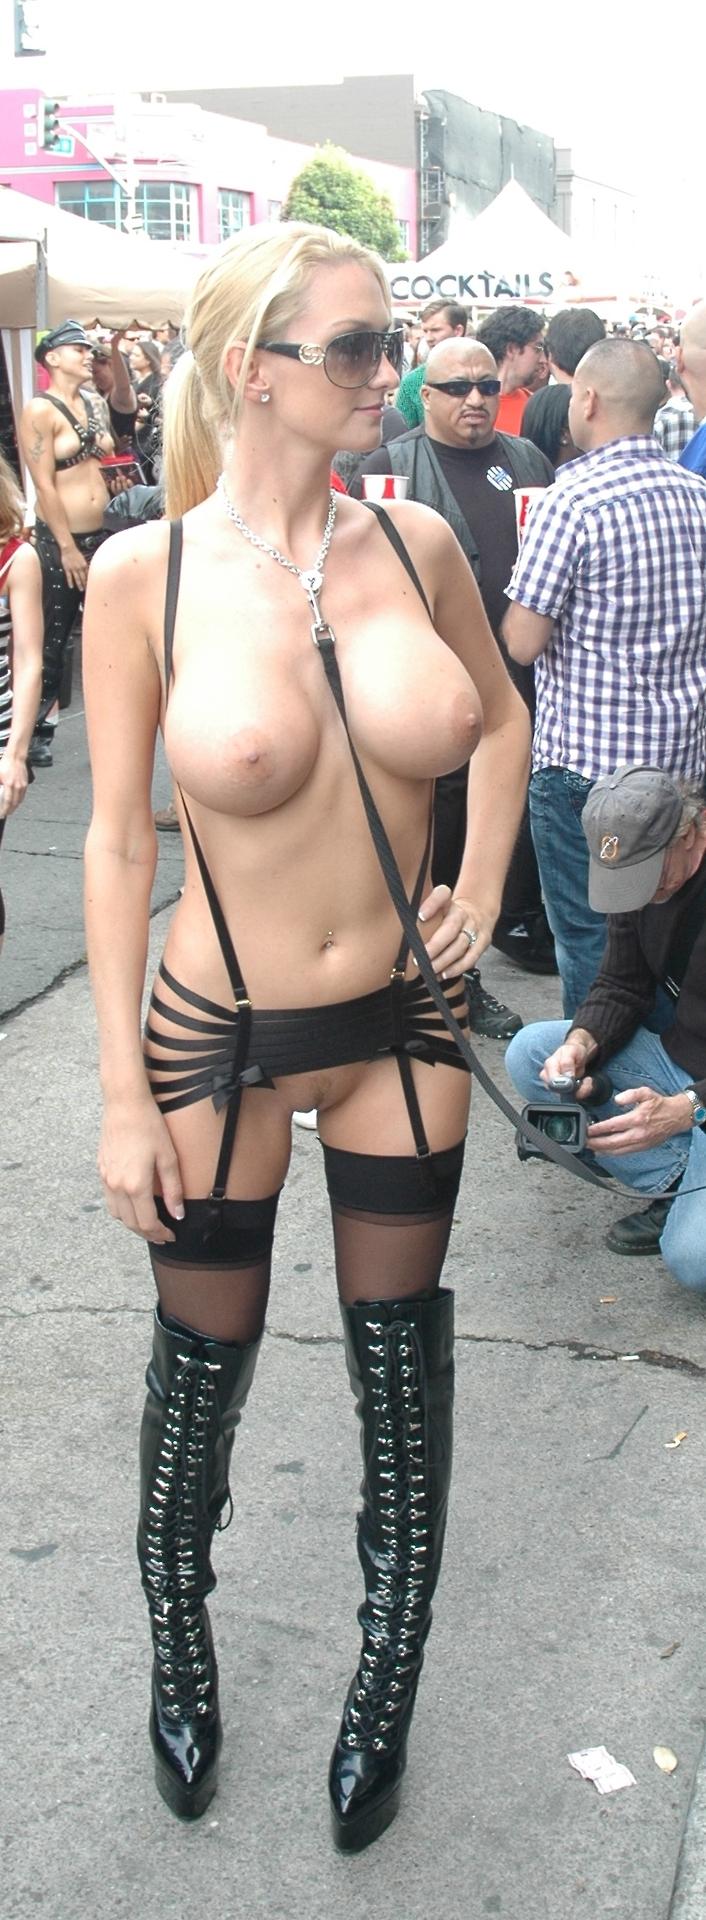 Submissive Readytobeused Piercednipples Collar Leash